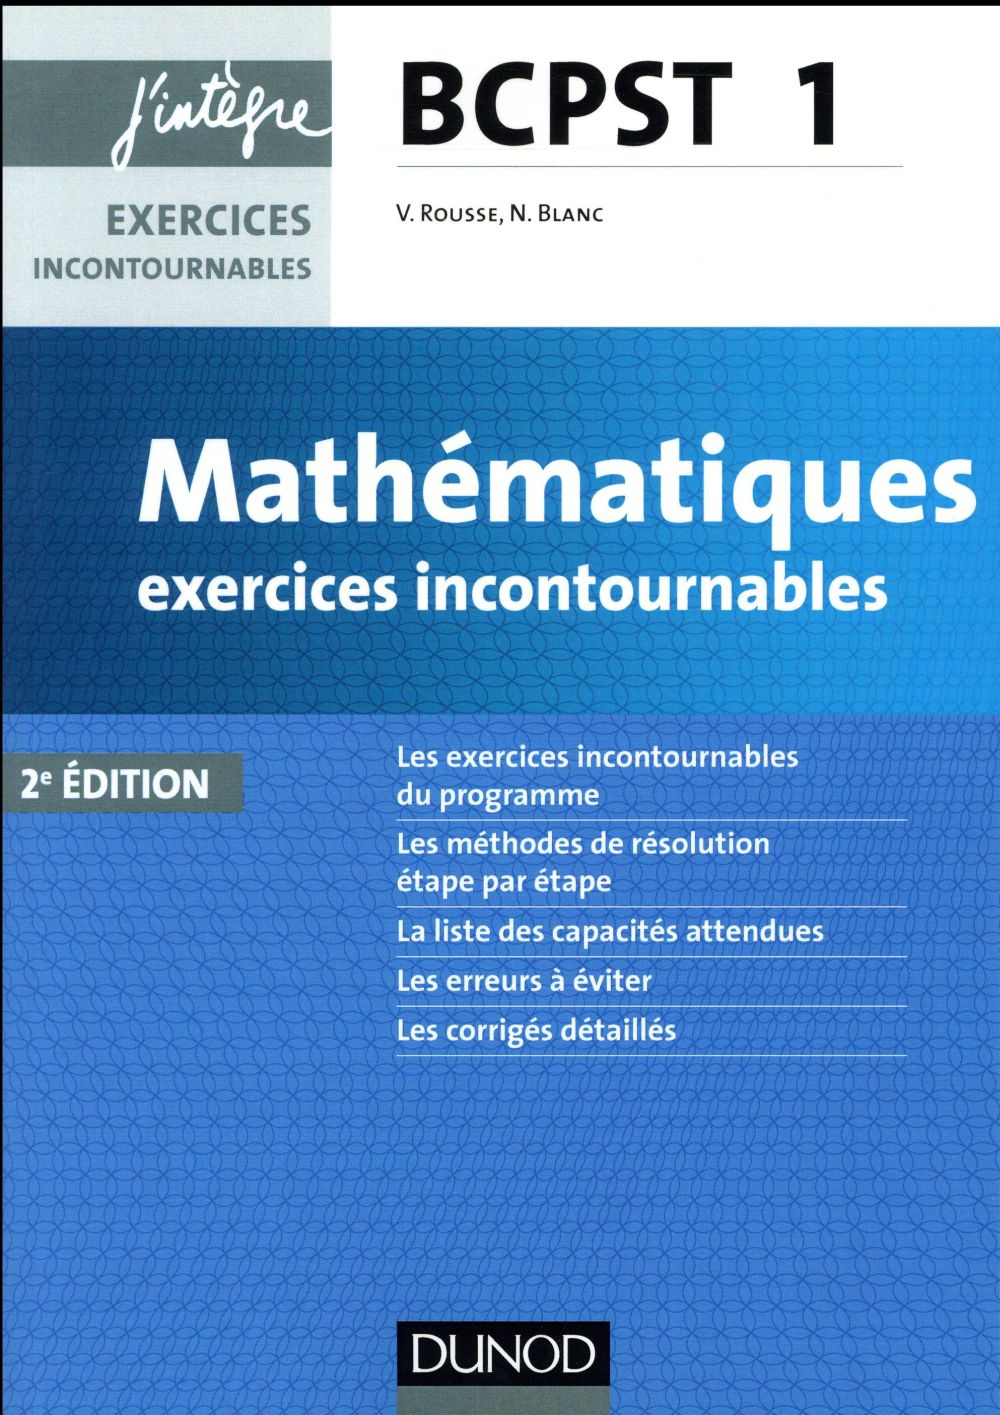 Blanc Nicolas - MATHEMATIQUES EXERCICES INCONTOURNABLES BCPST 1 - 2E ED.